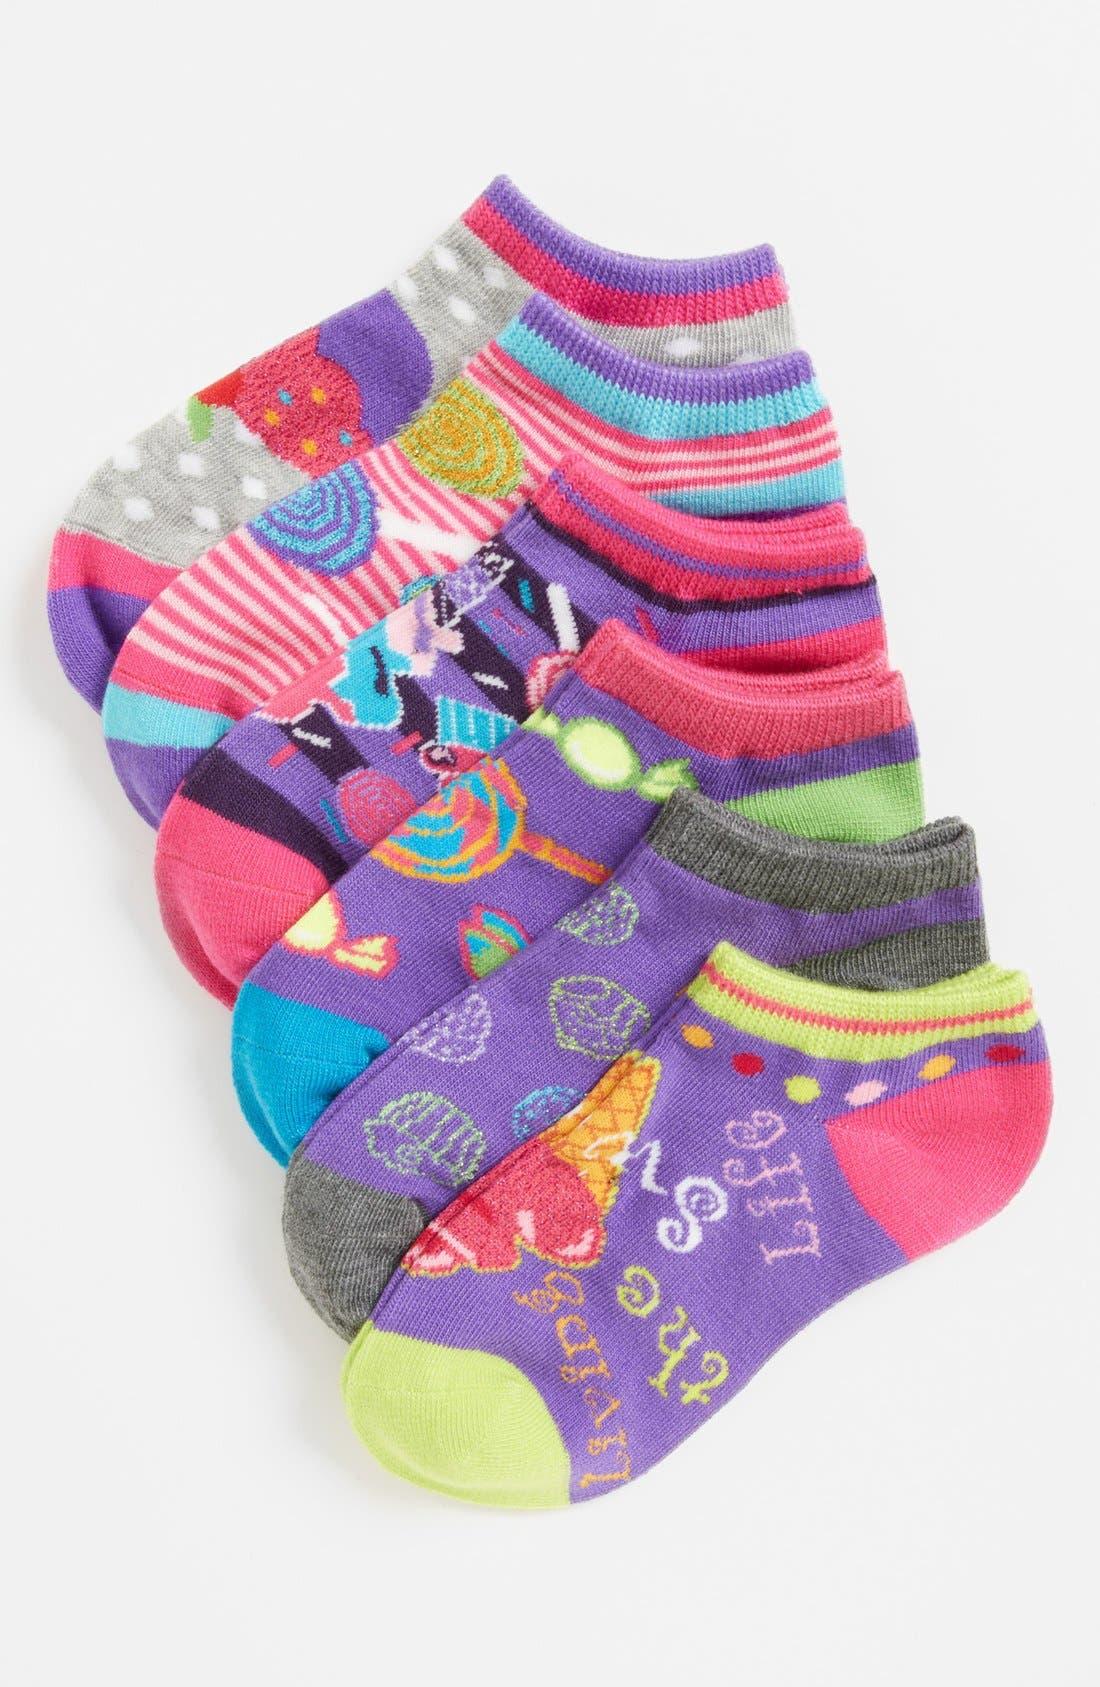 Alternate Image 1 Selected - Nordstrom 'Food Friends' Low Cut Socks (6-Pack) (Toddler Girls, Little Girls & Big Girls)